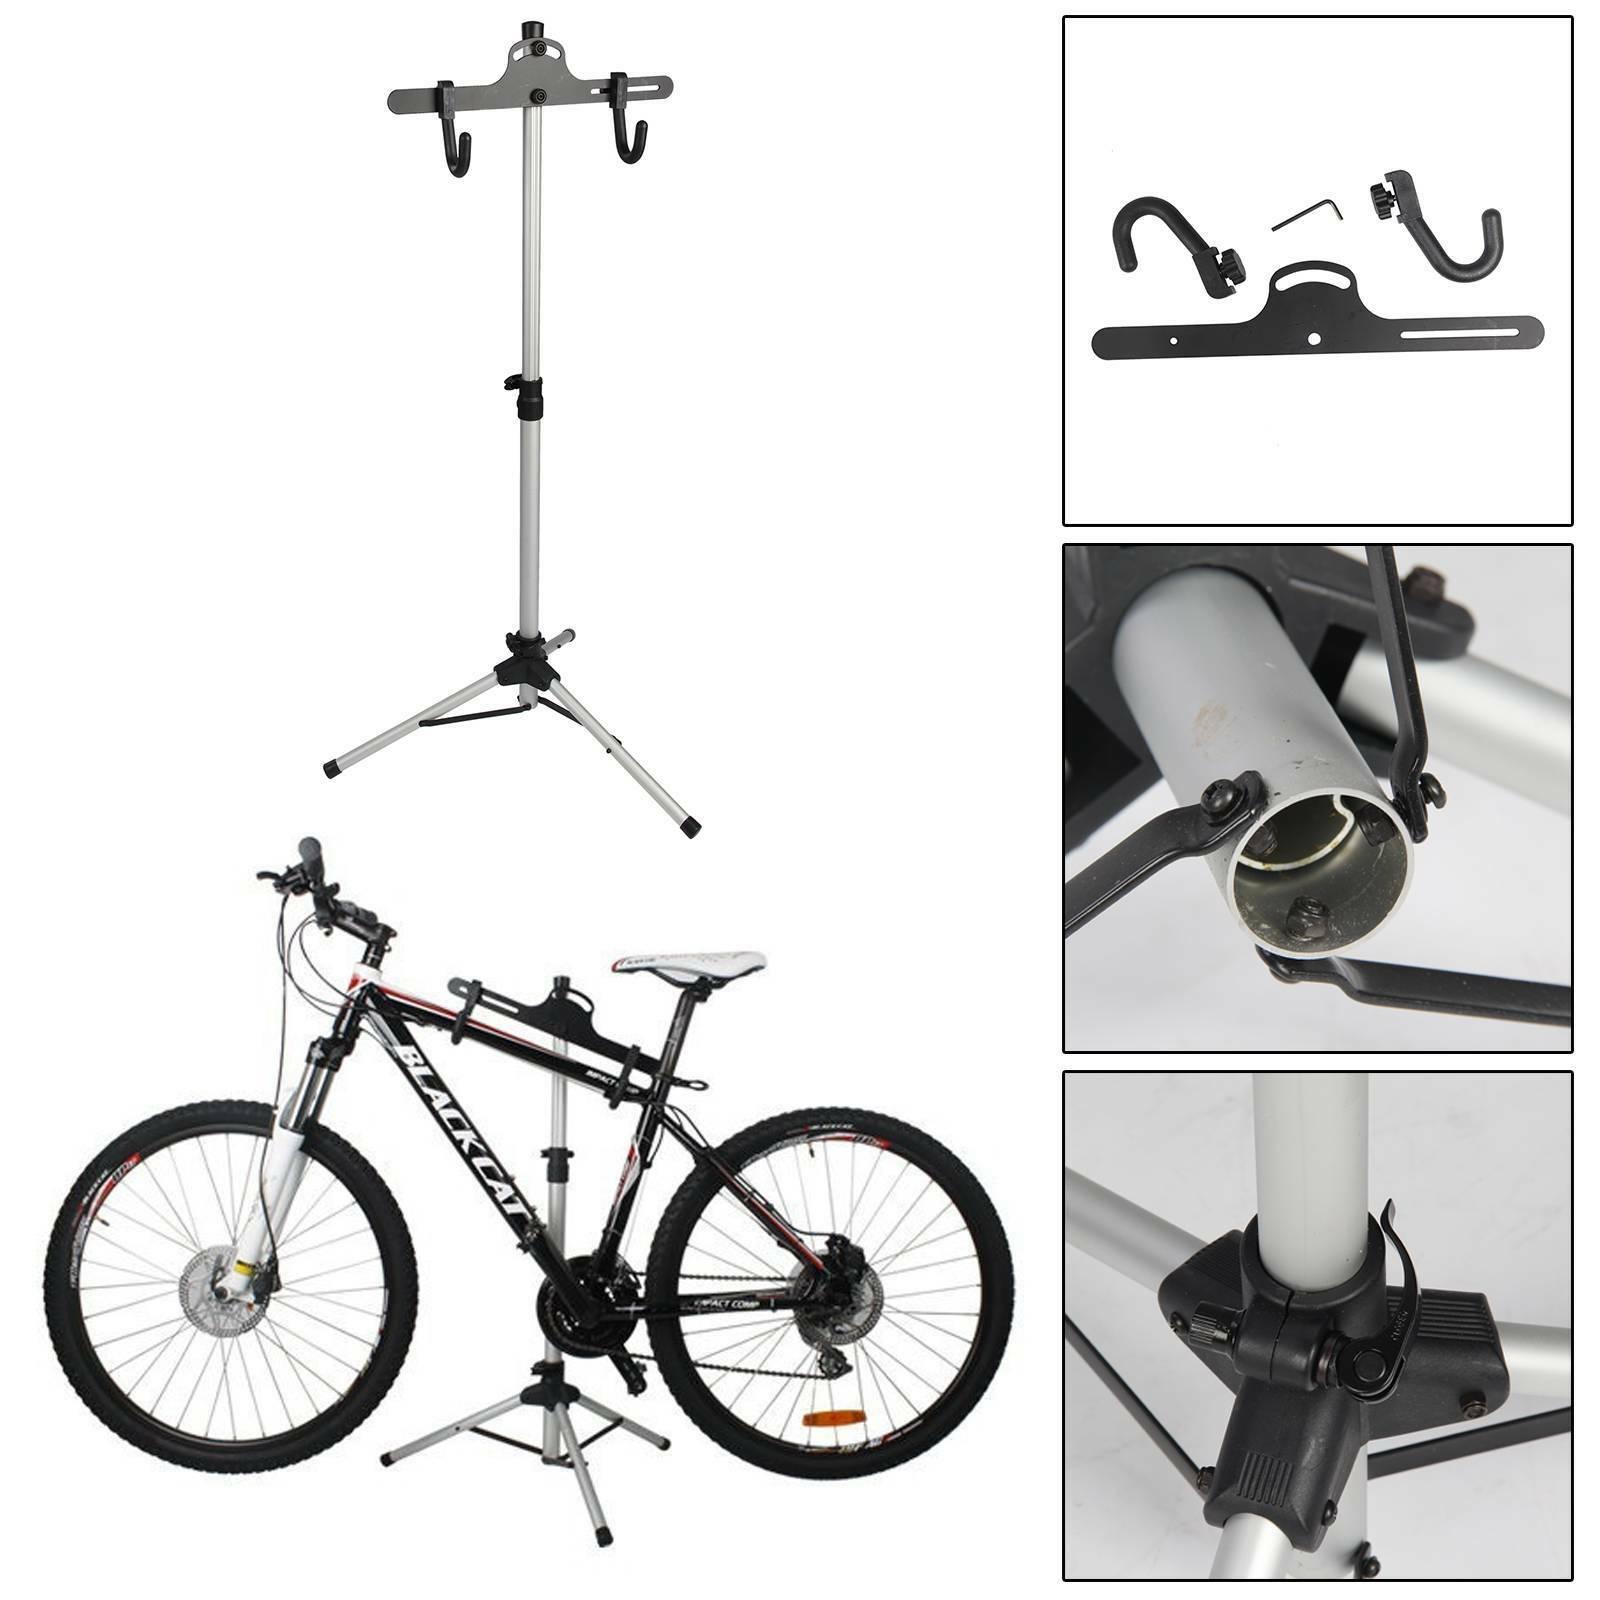 UK Bicycle Bike Home Adjustable Repair Mechanic Maintenance Stand Workstand